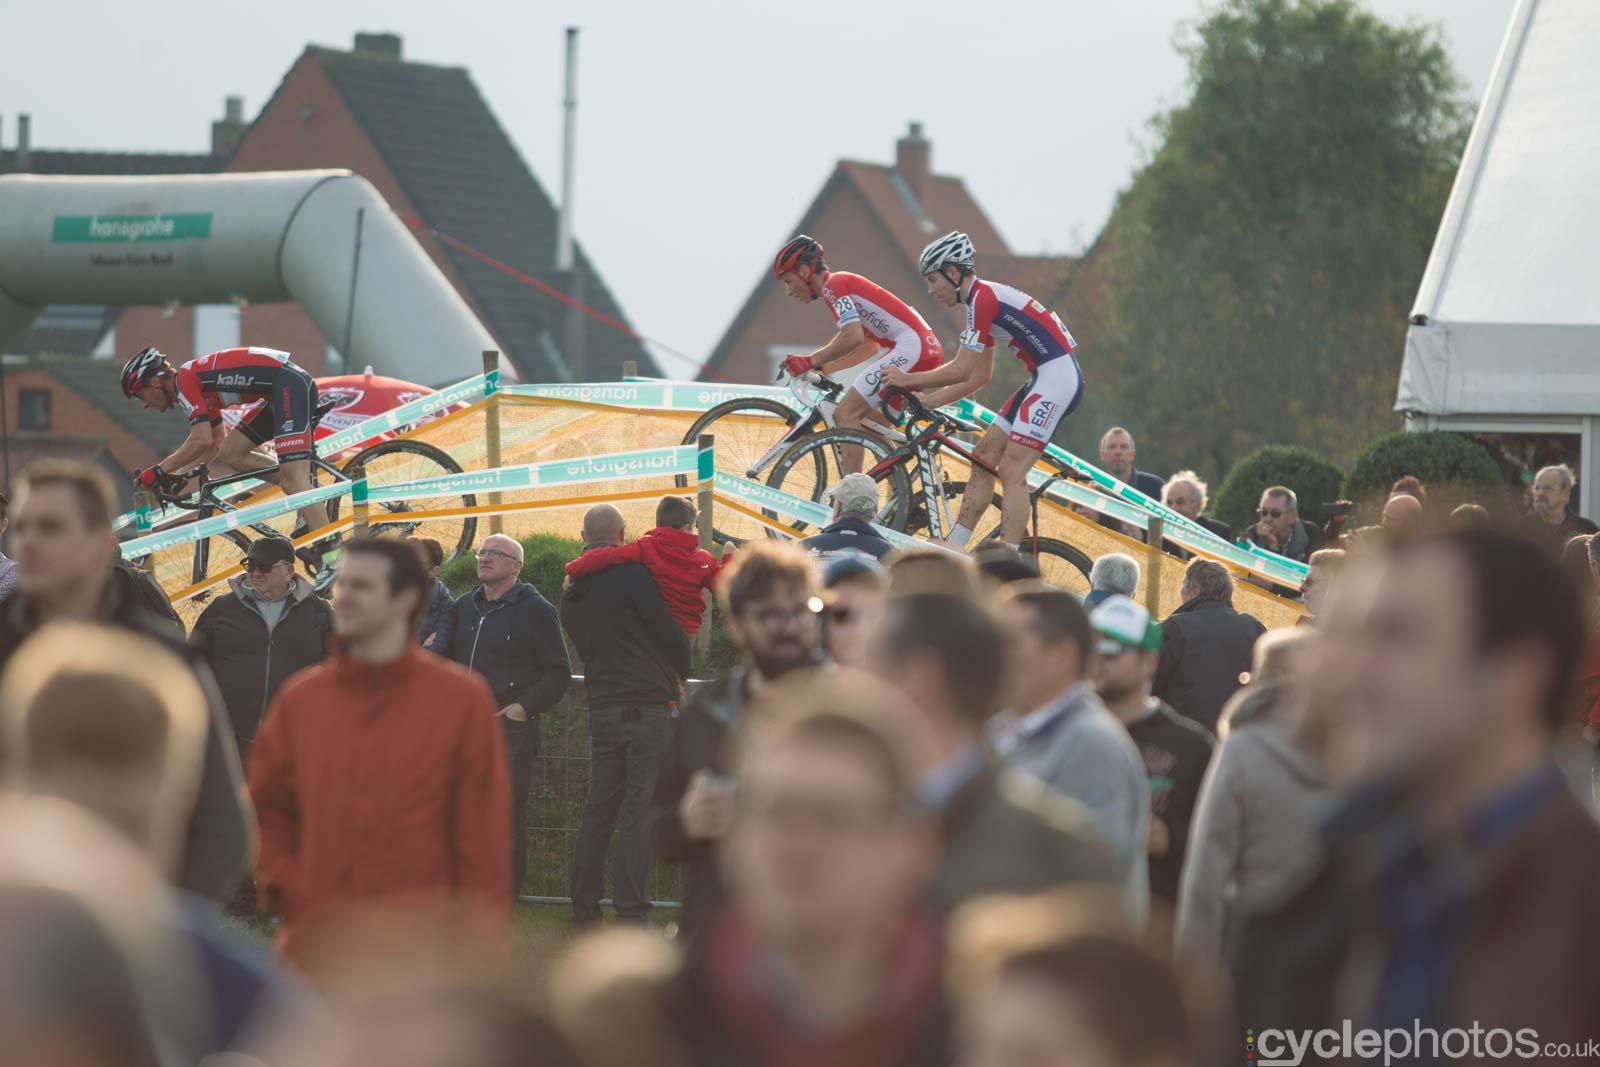 2015-cyclephotos-cyclocross-ruddervoorde-151643